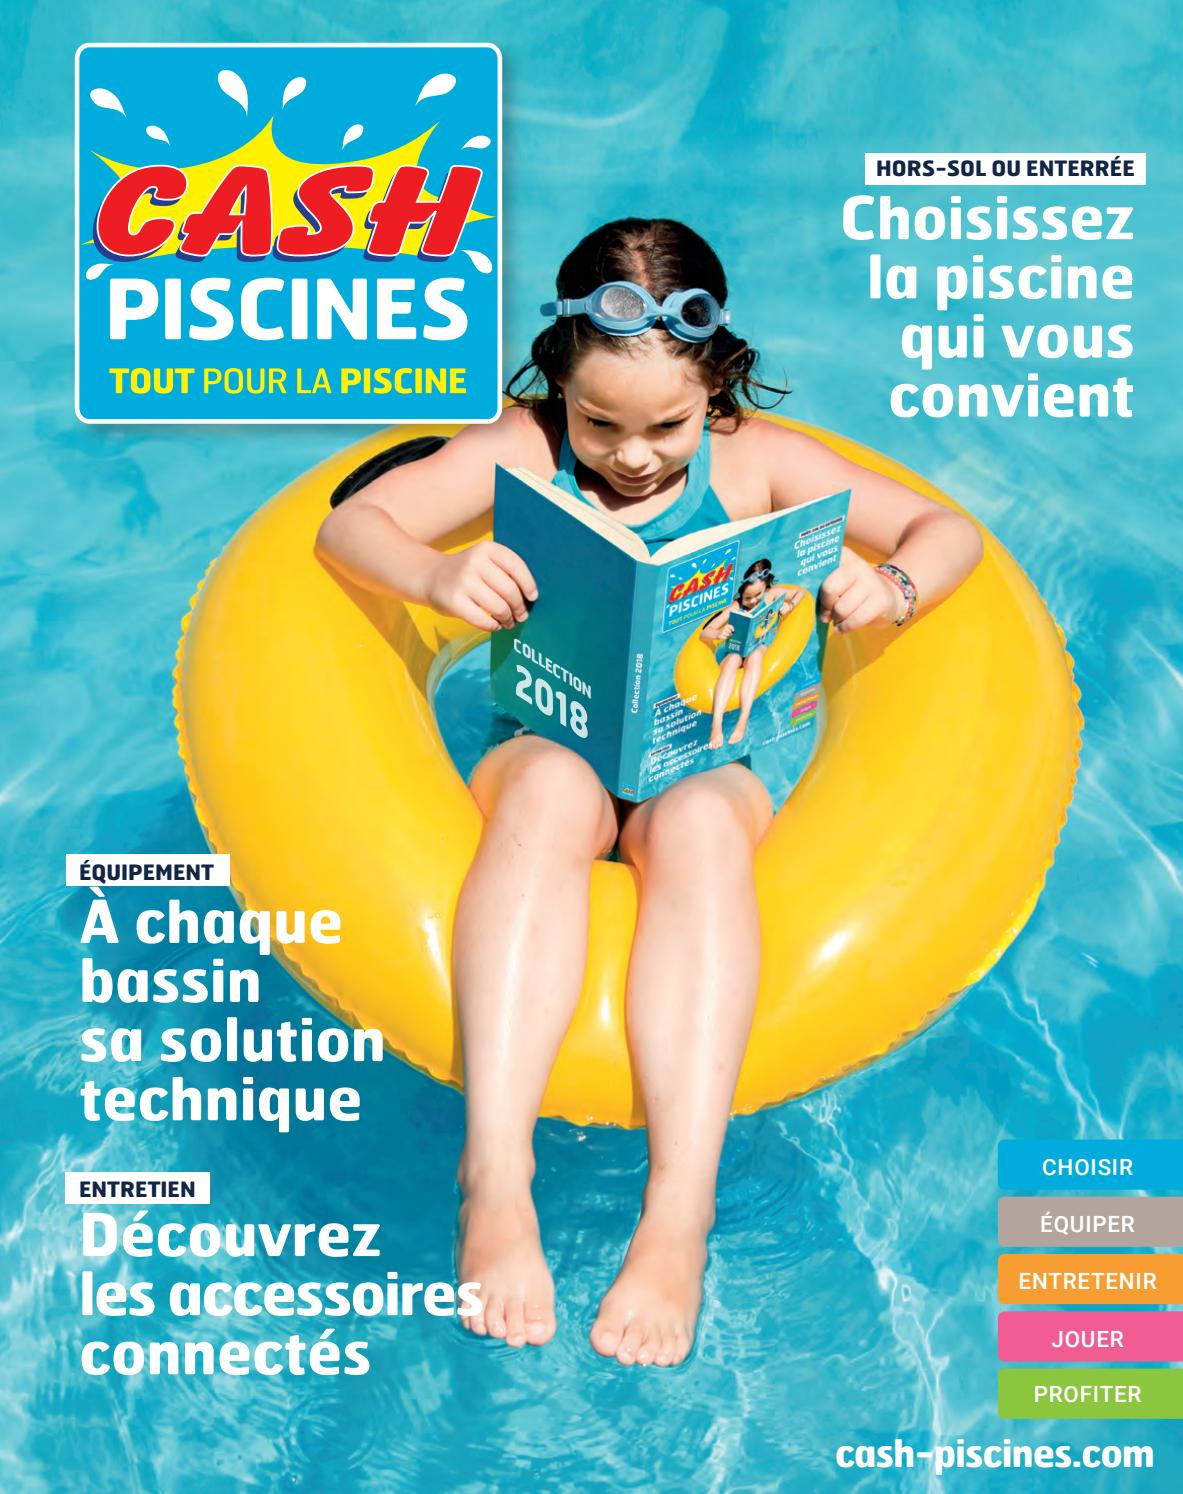 Catalogue Cash Piscine 2018 By Octave Octave - Issuu dedans Cash Piscine Cahors